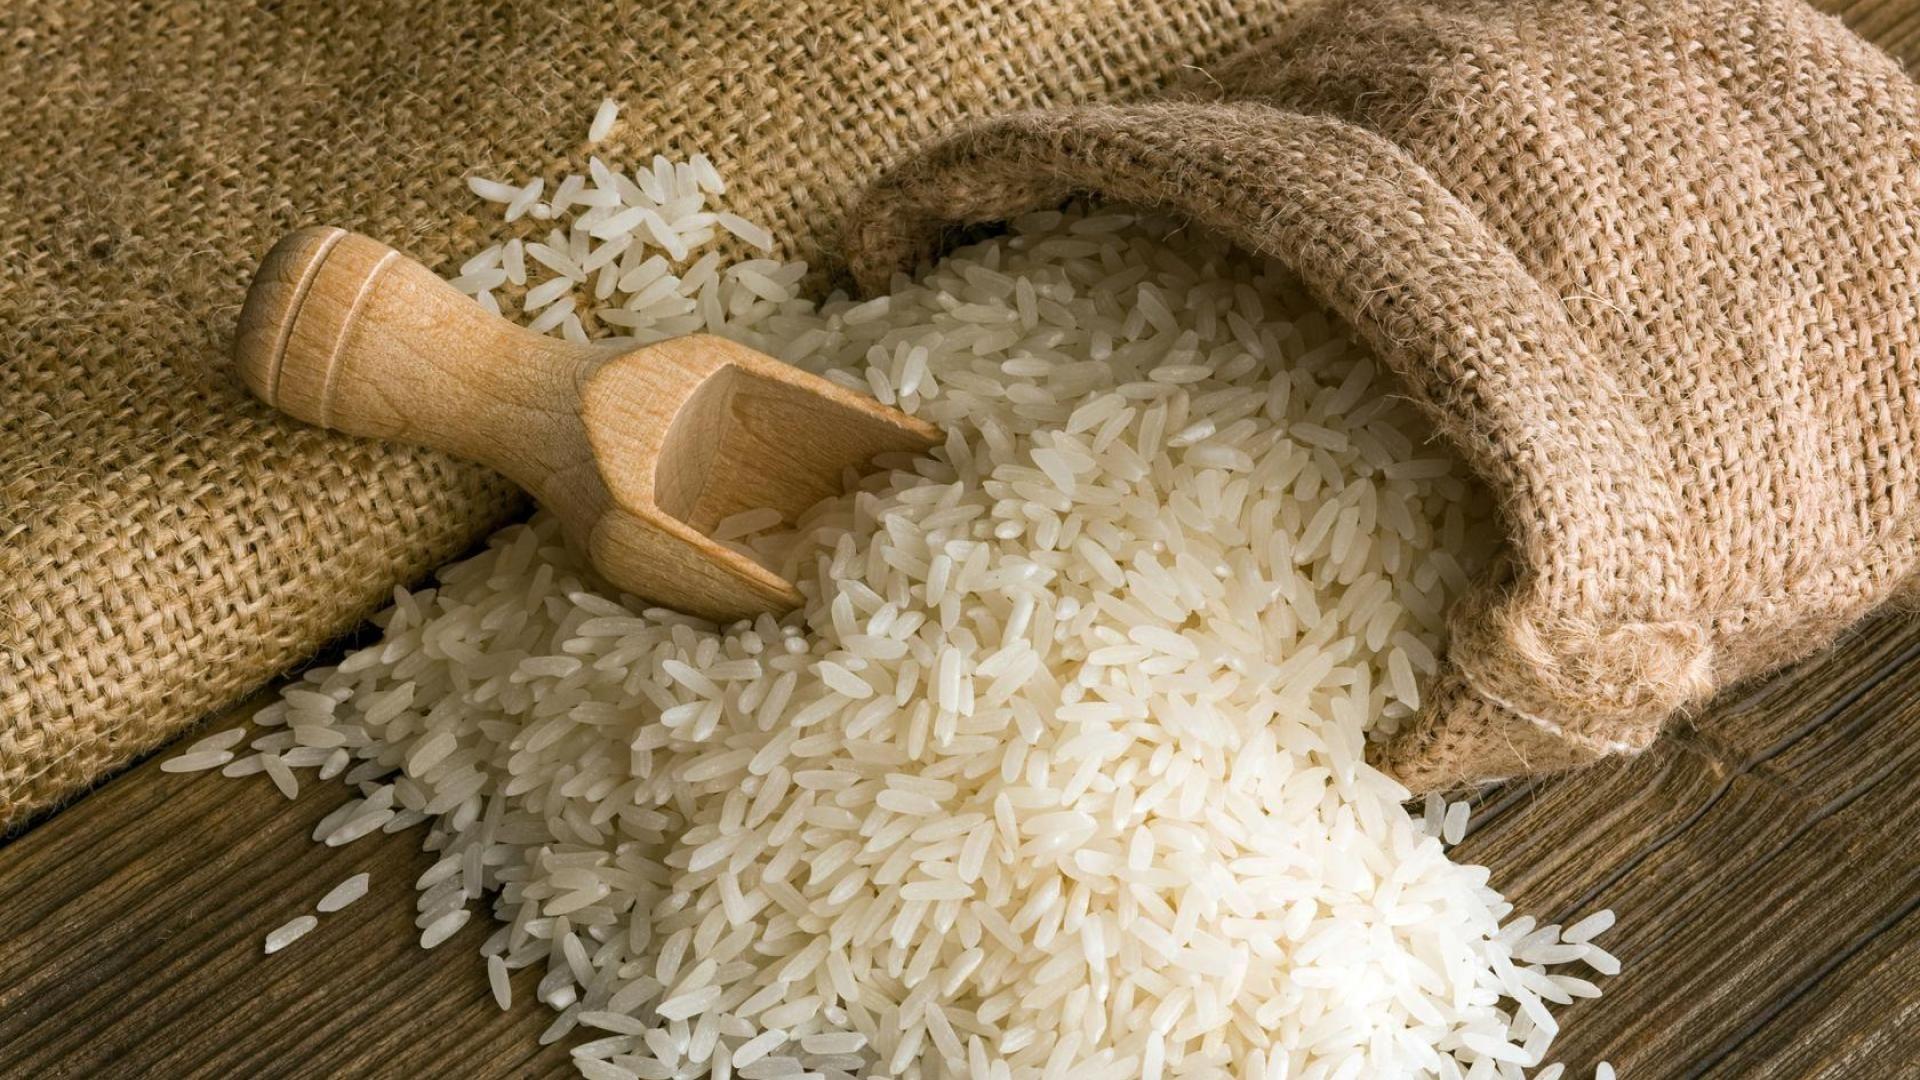 Rice 1080p wallpaper